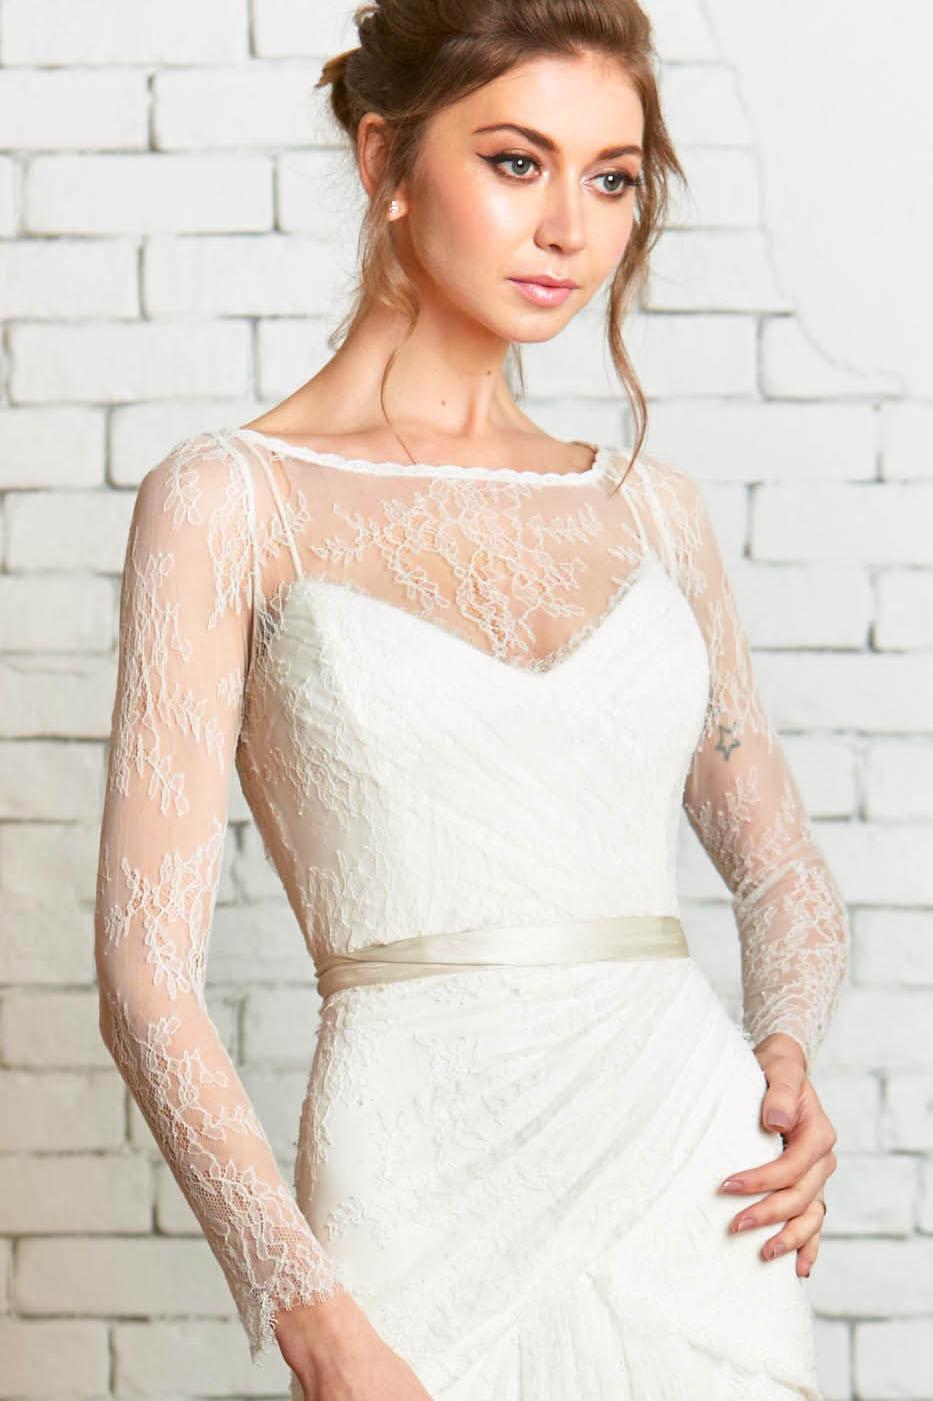 BrookeTop-1-Front_Long_Sleeve_Lace_Wedding_Topper_Scoop_Neck.jpg